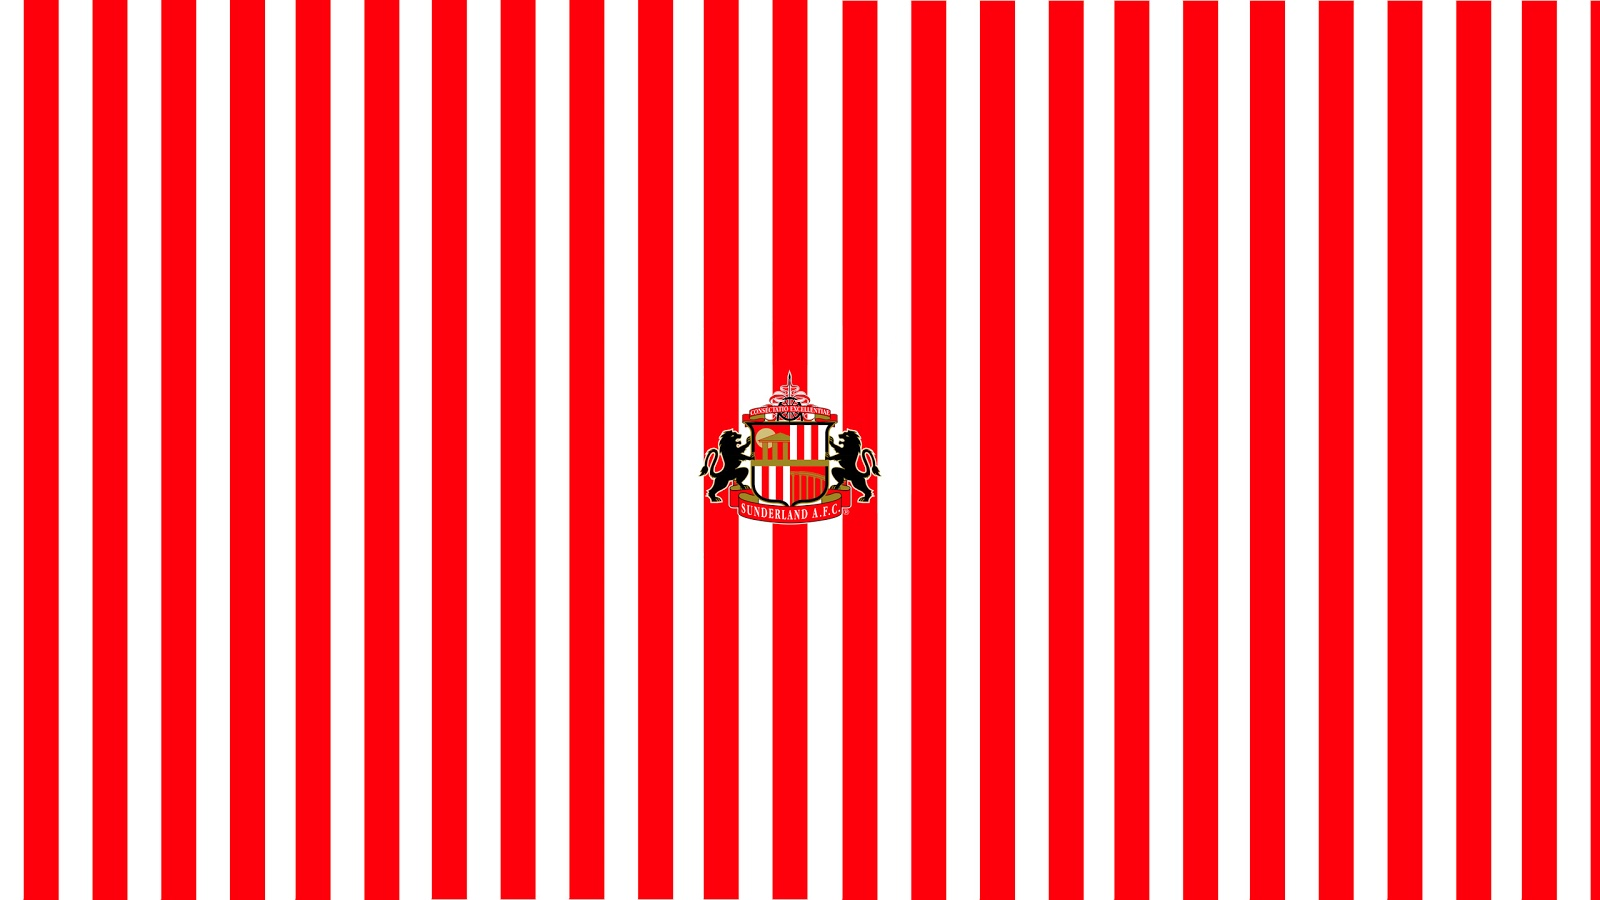 England Football Logos: Sunderland FC Logo Pictures